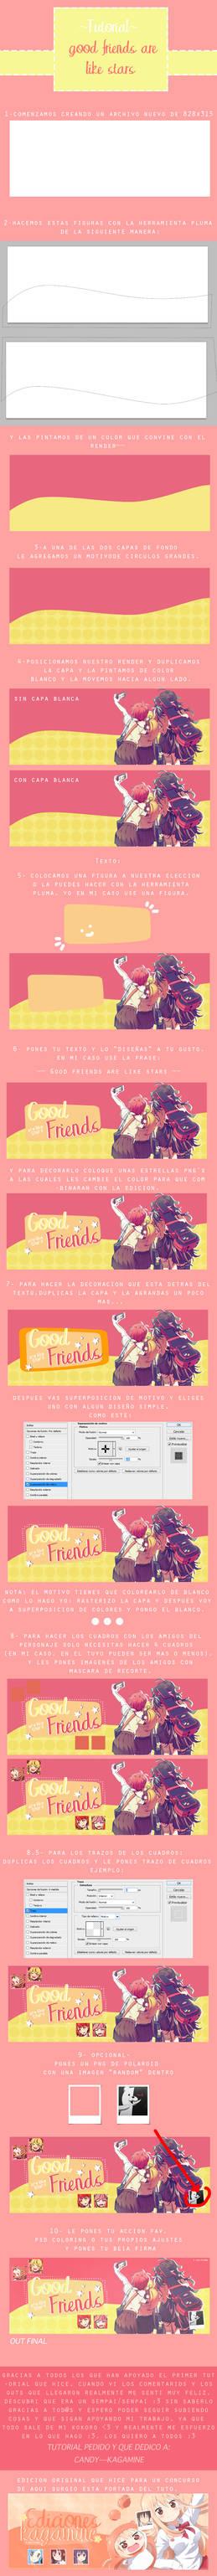 Tutorial ~~ good friends are like stars ~~